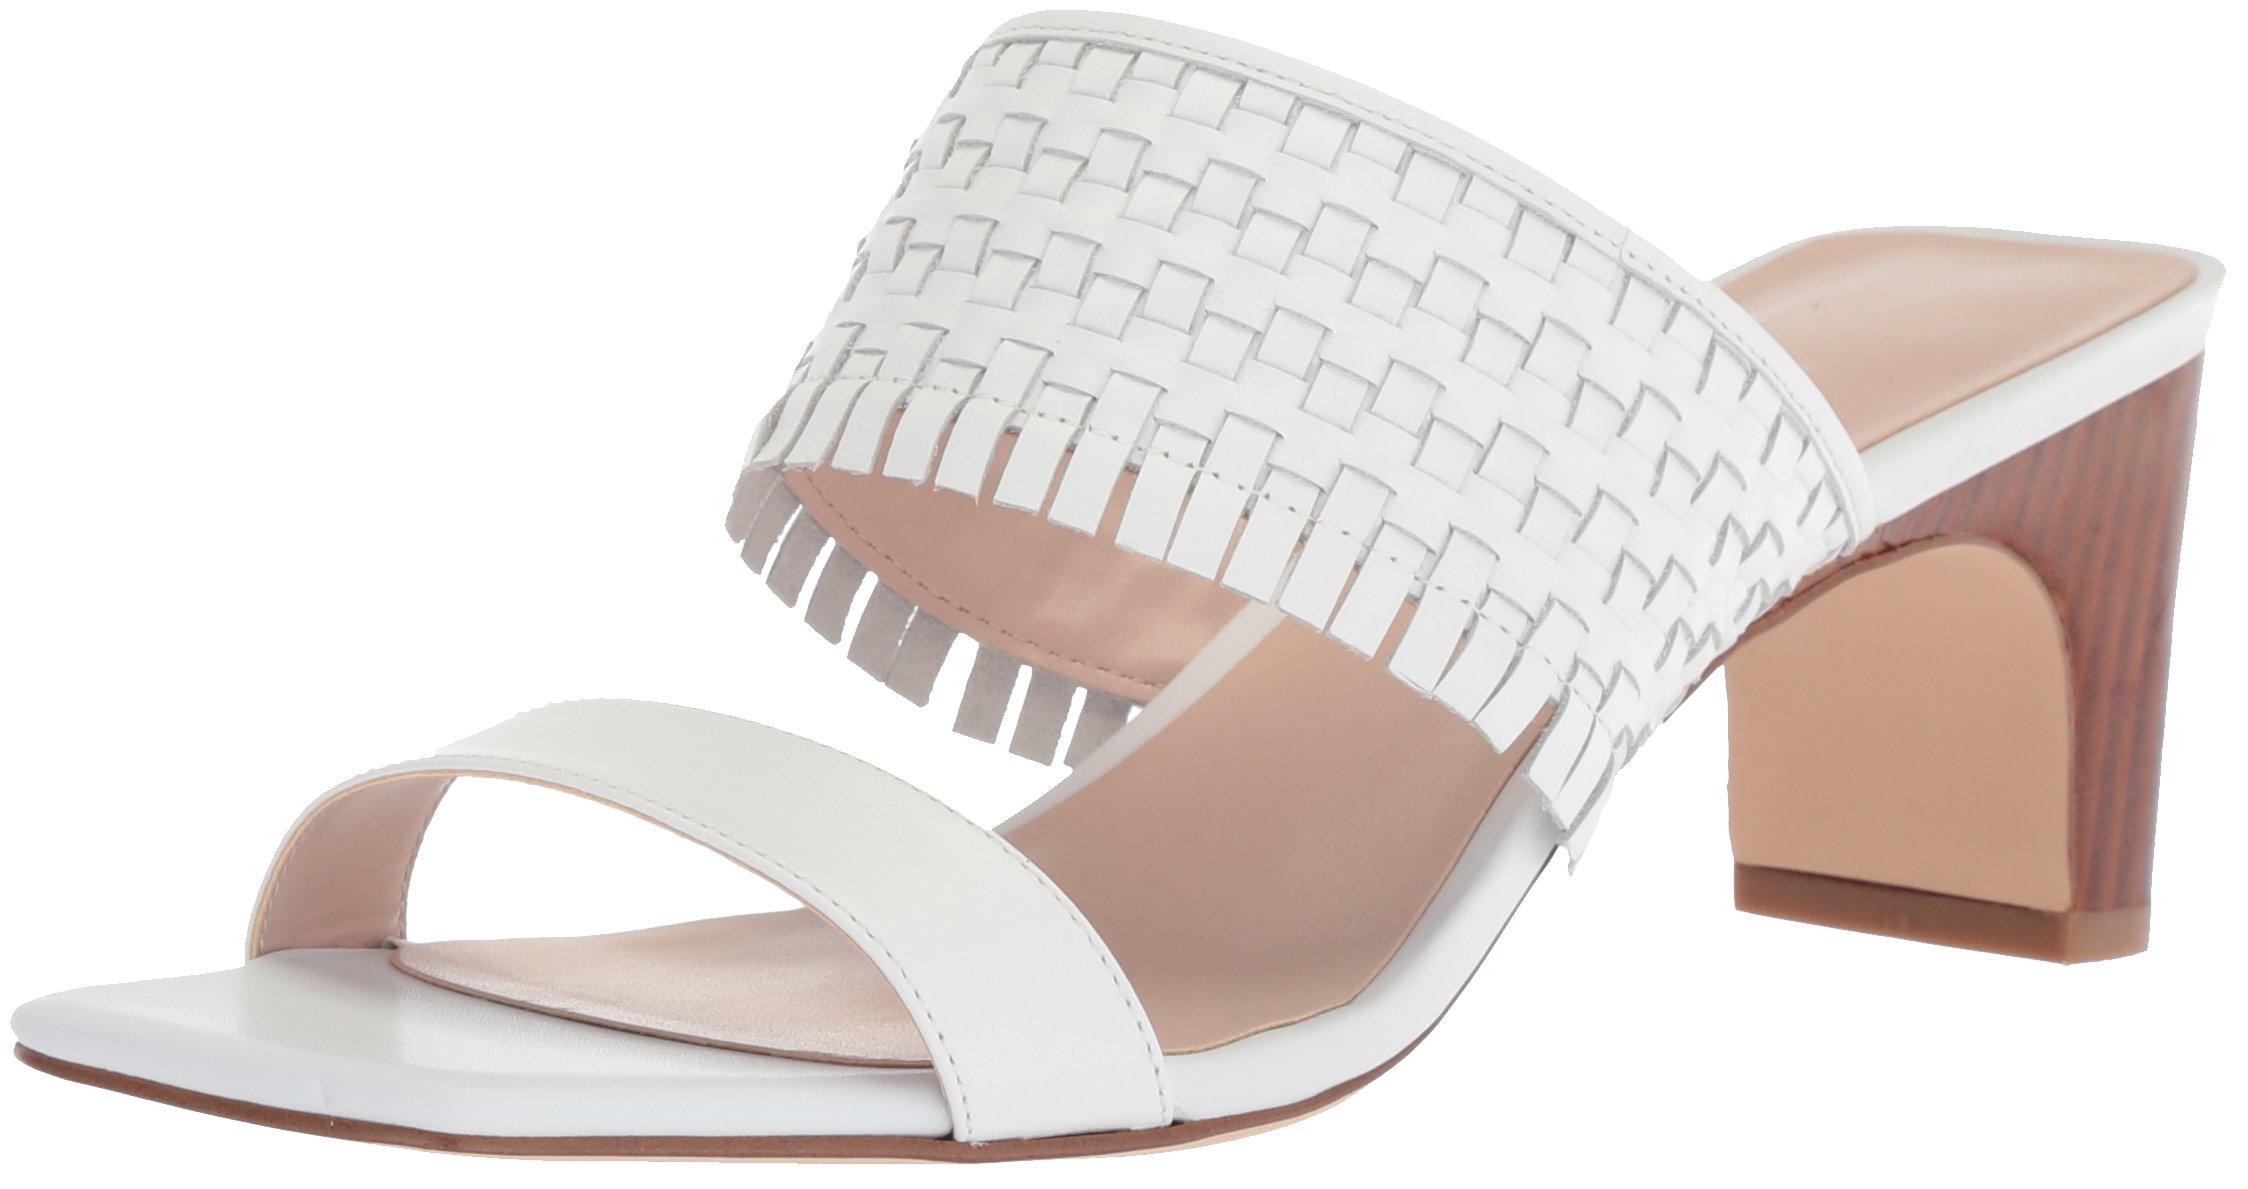 Nine West Women's Nirveli Leather Slide Sandal, White Leather, 6.5 Medium US